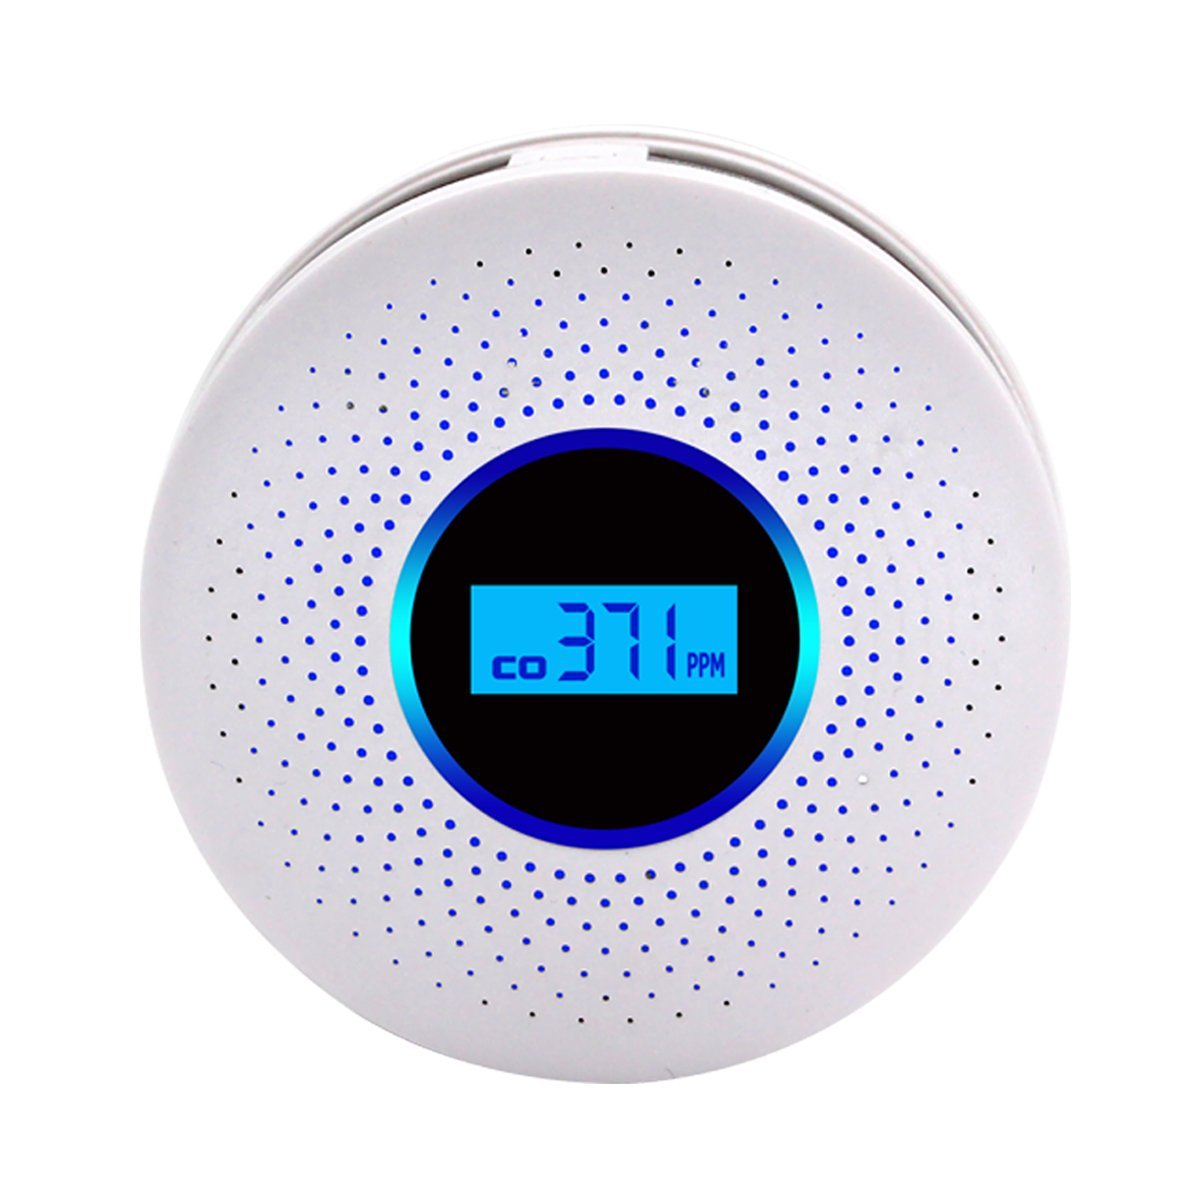 2 in 1 Carbon Monoxide&Smoke Alarm Smoke Fire Sensor Alarm CO Carbon Monoxide Detector Sound Combo Sensor Tester Battery Operated with Display for CO Level Black FridaySale